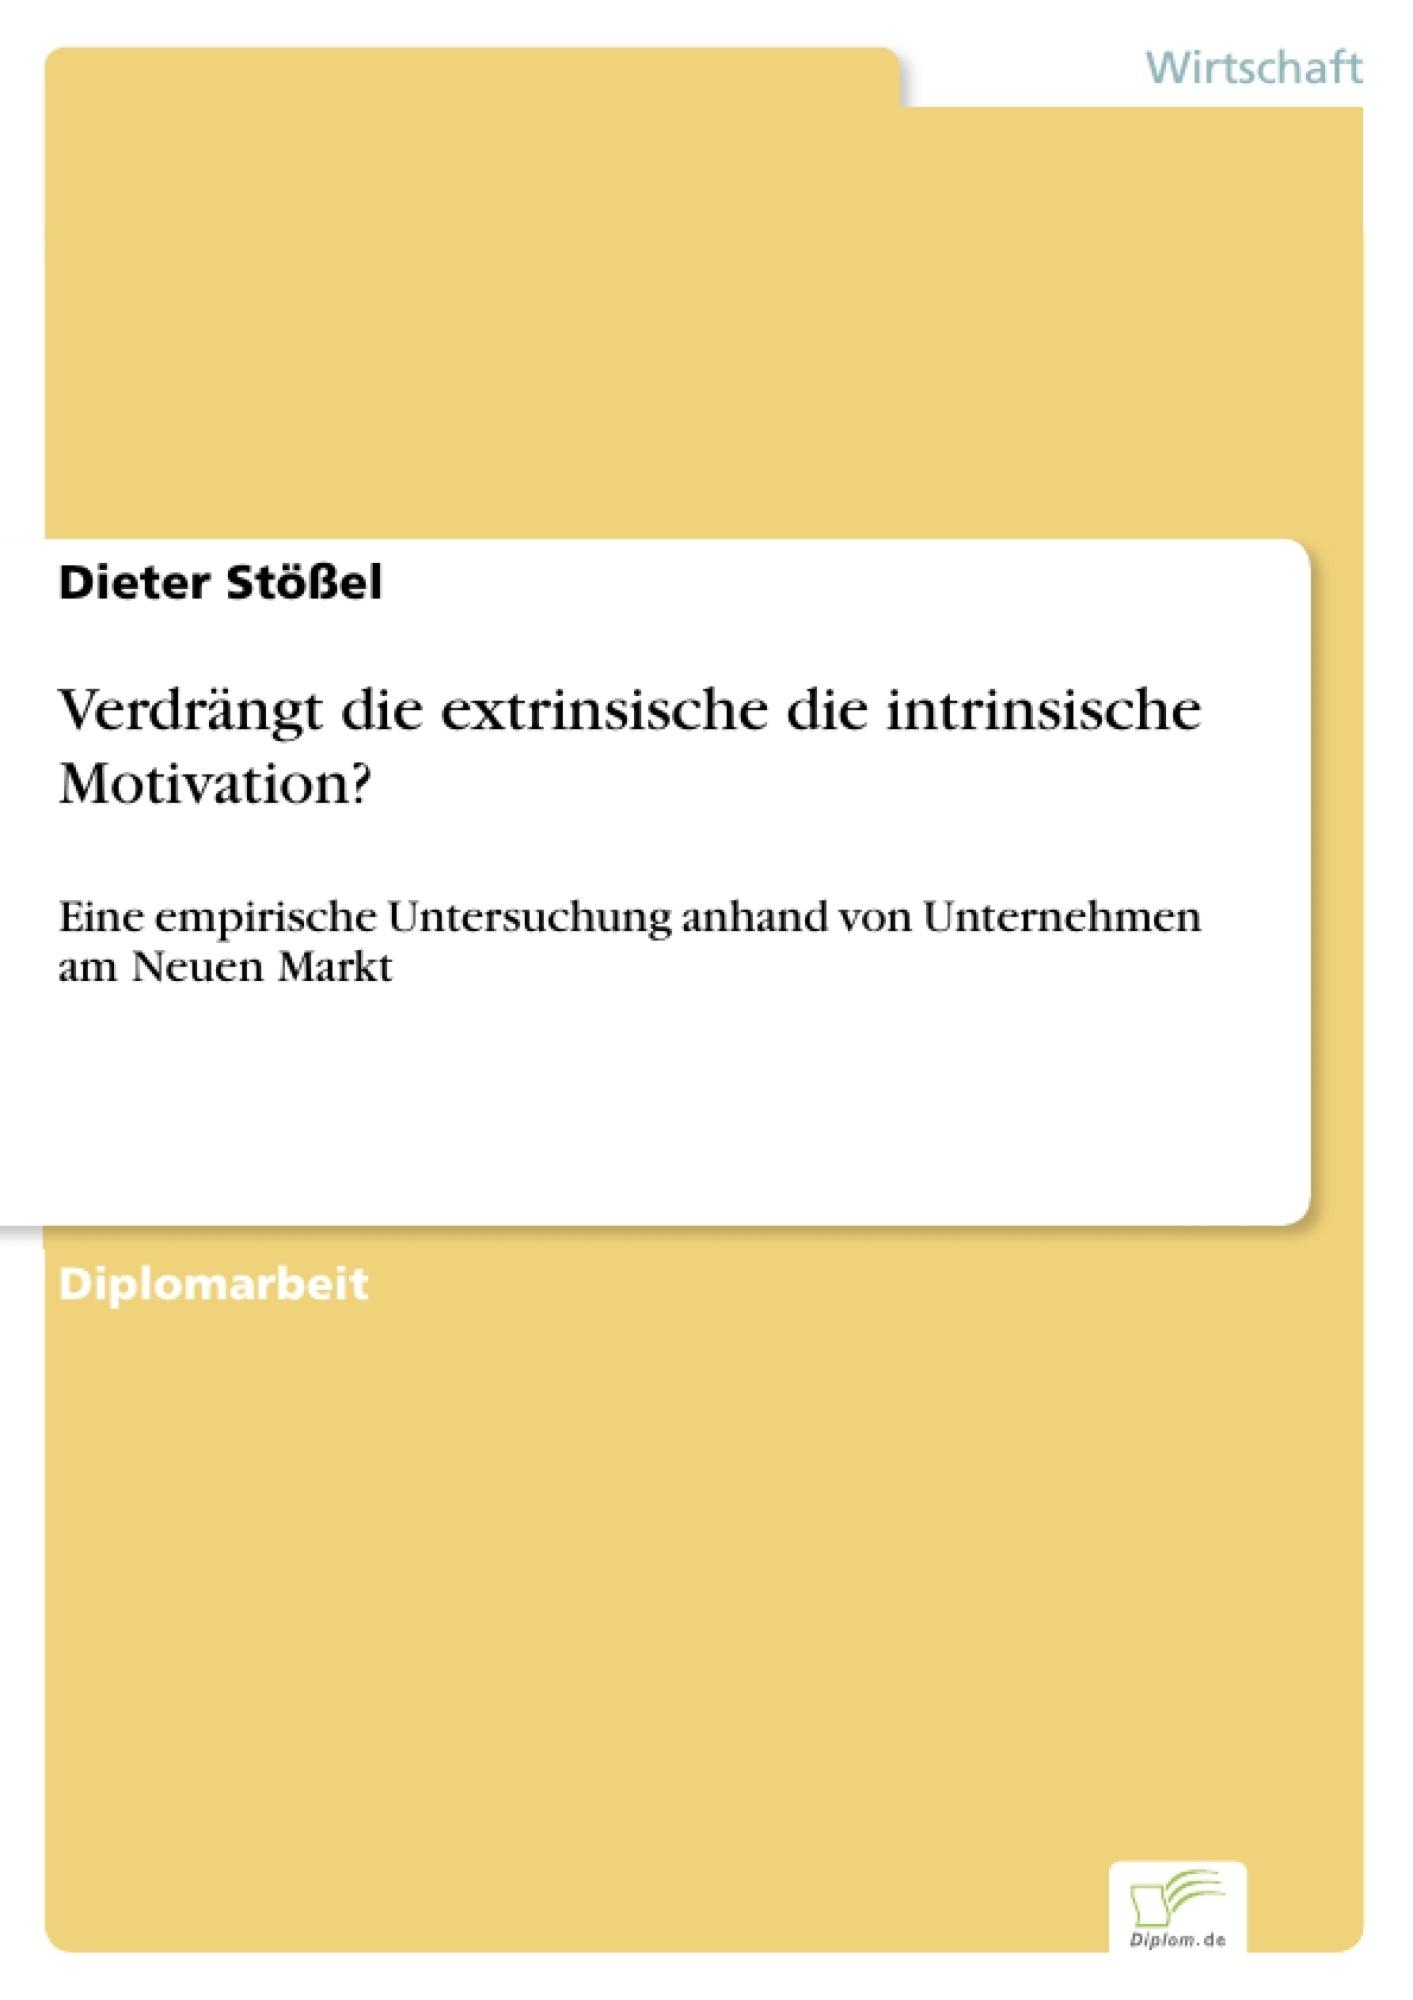 extrinsisch motiviert